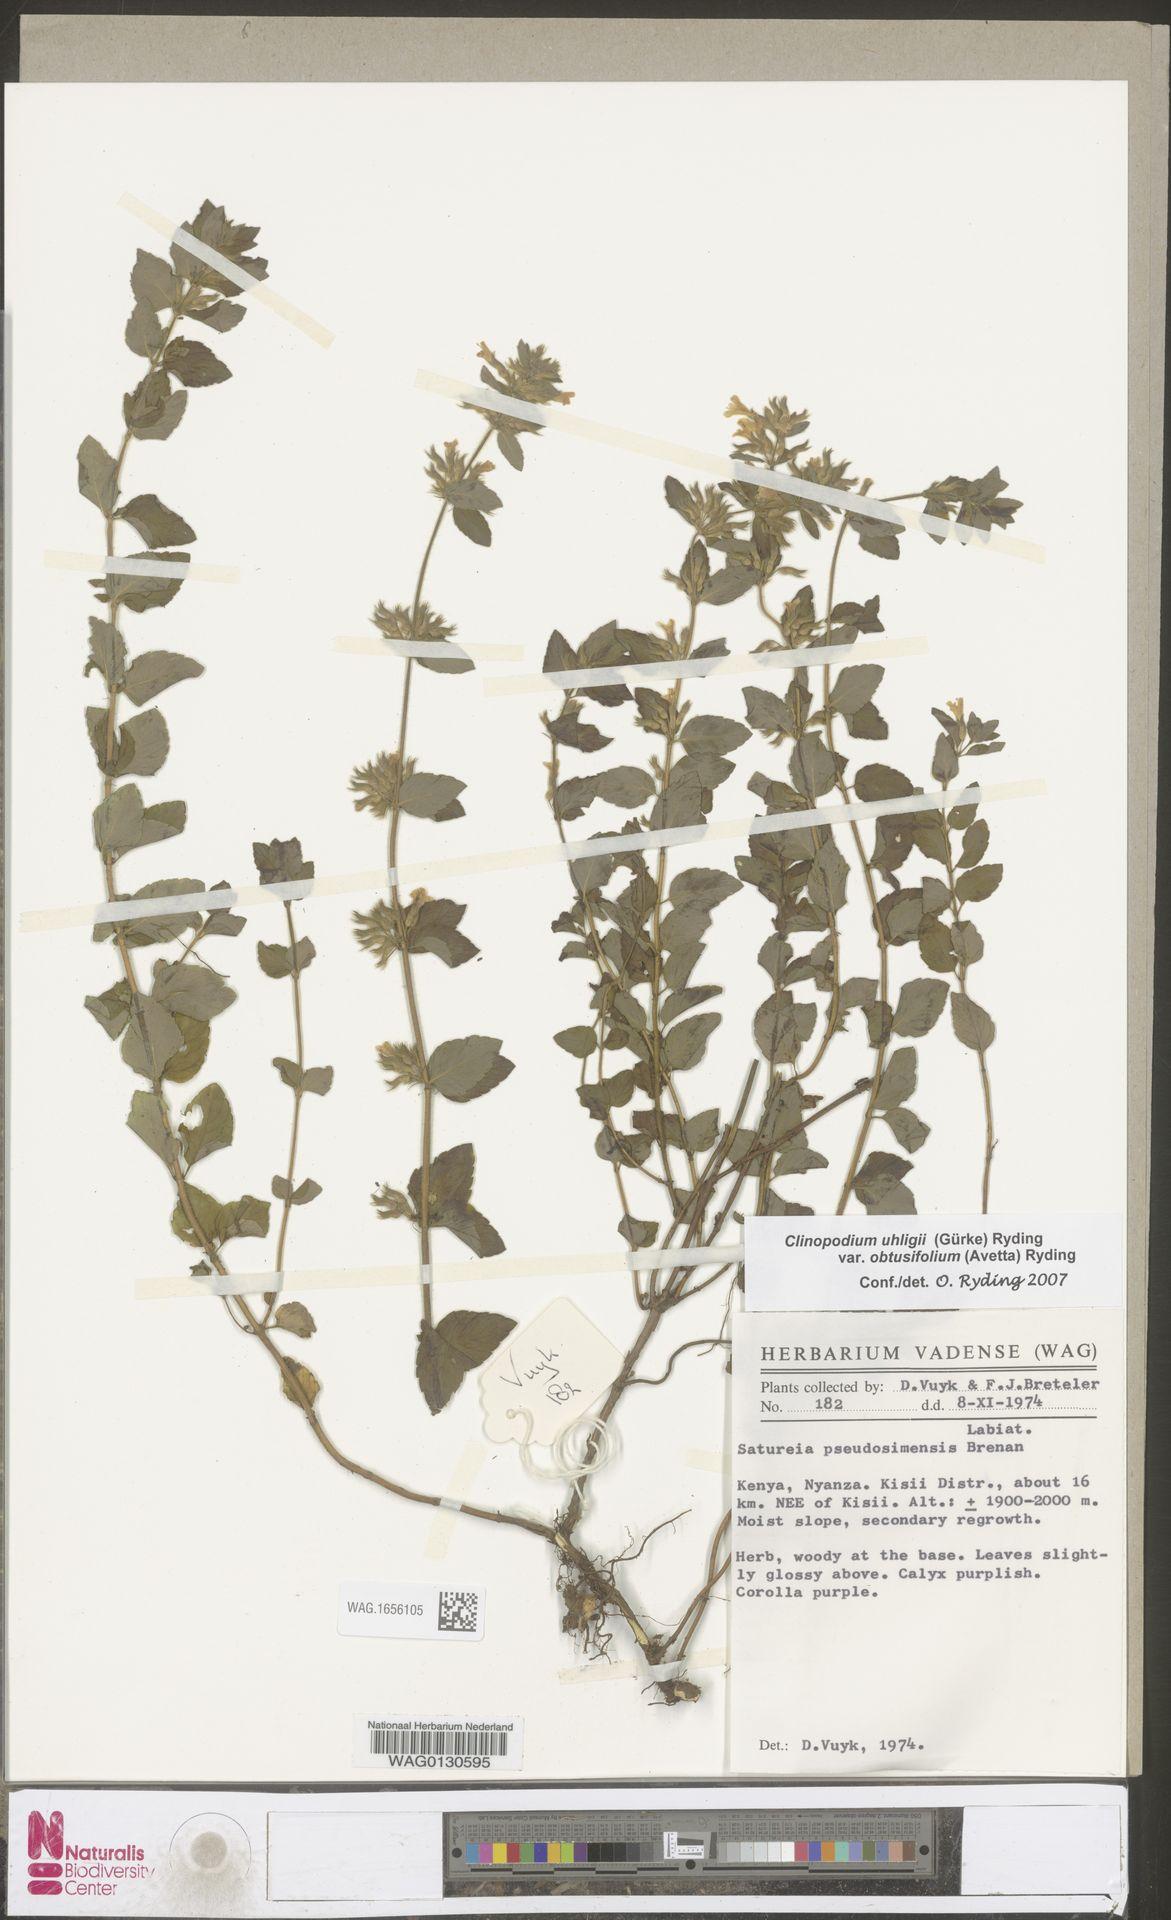 WAG.1656105 | Clinopodium uhligii var. obtusifolium (Avetta) Ryding